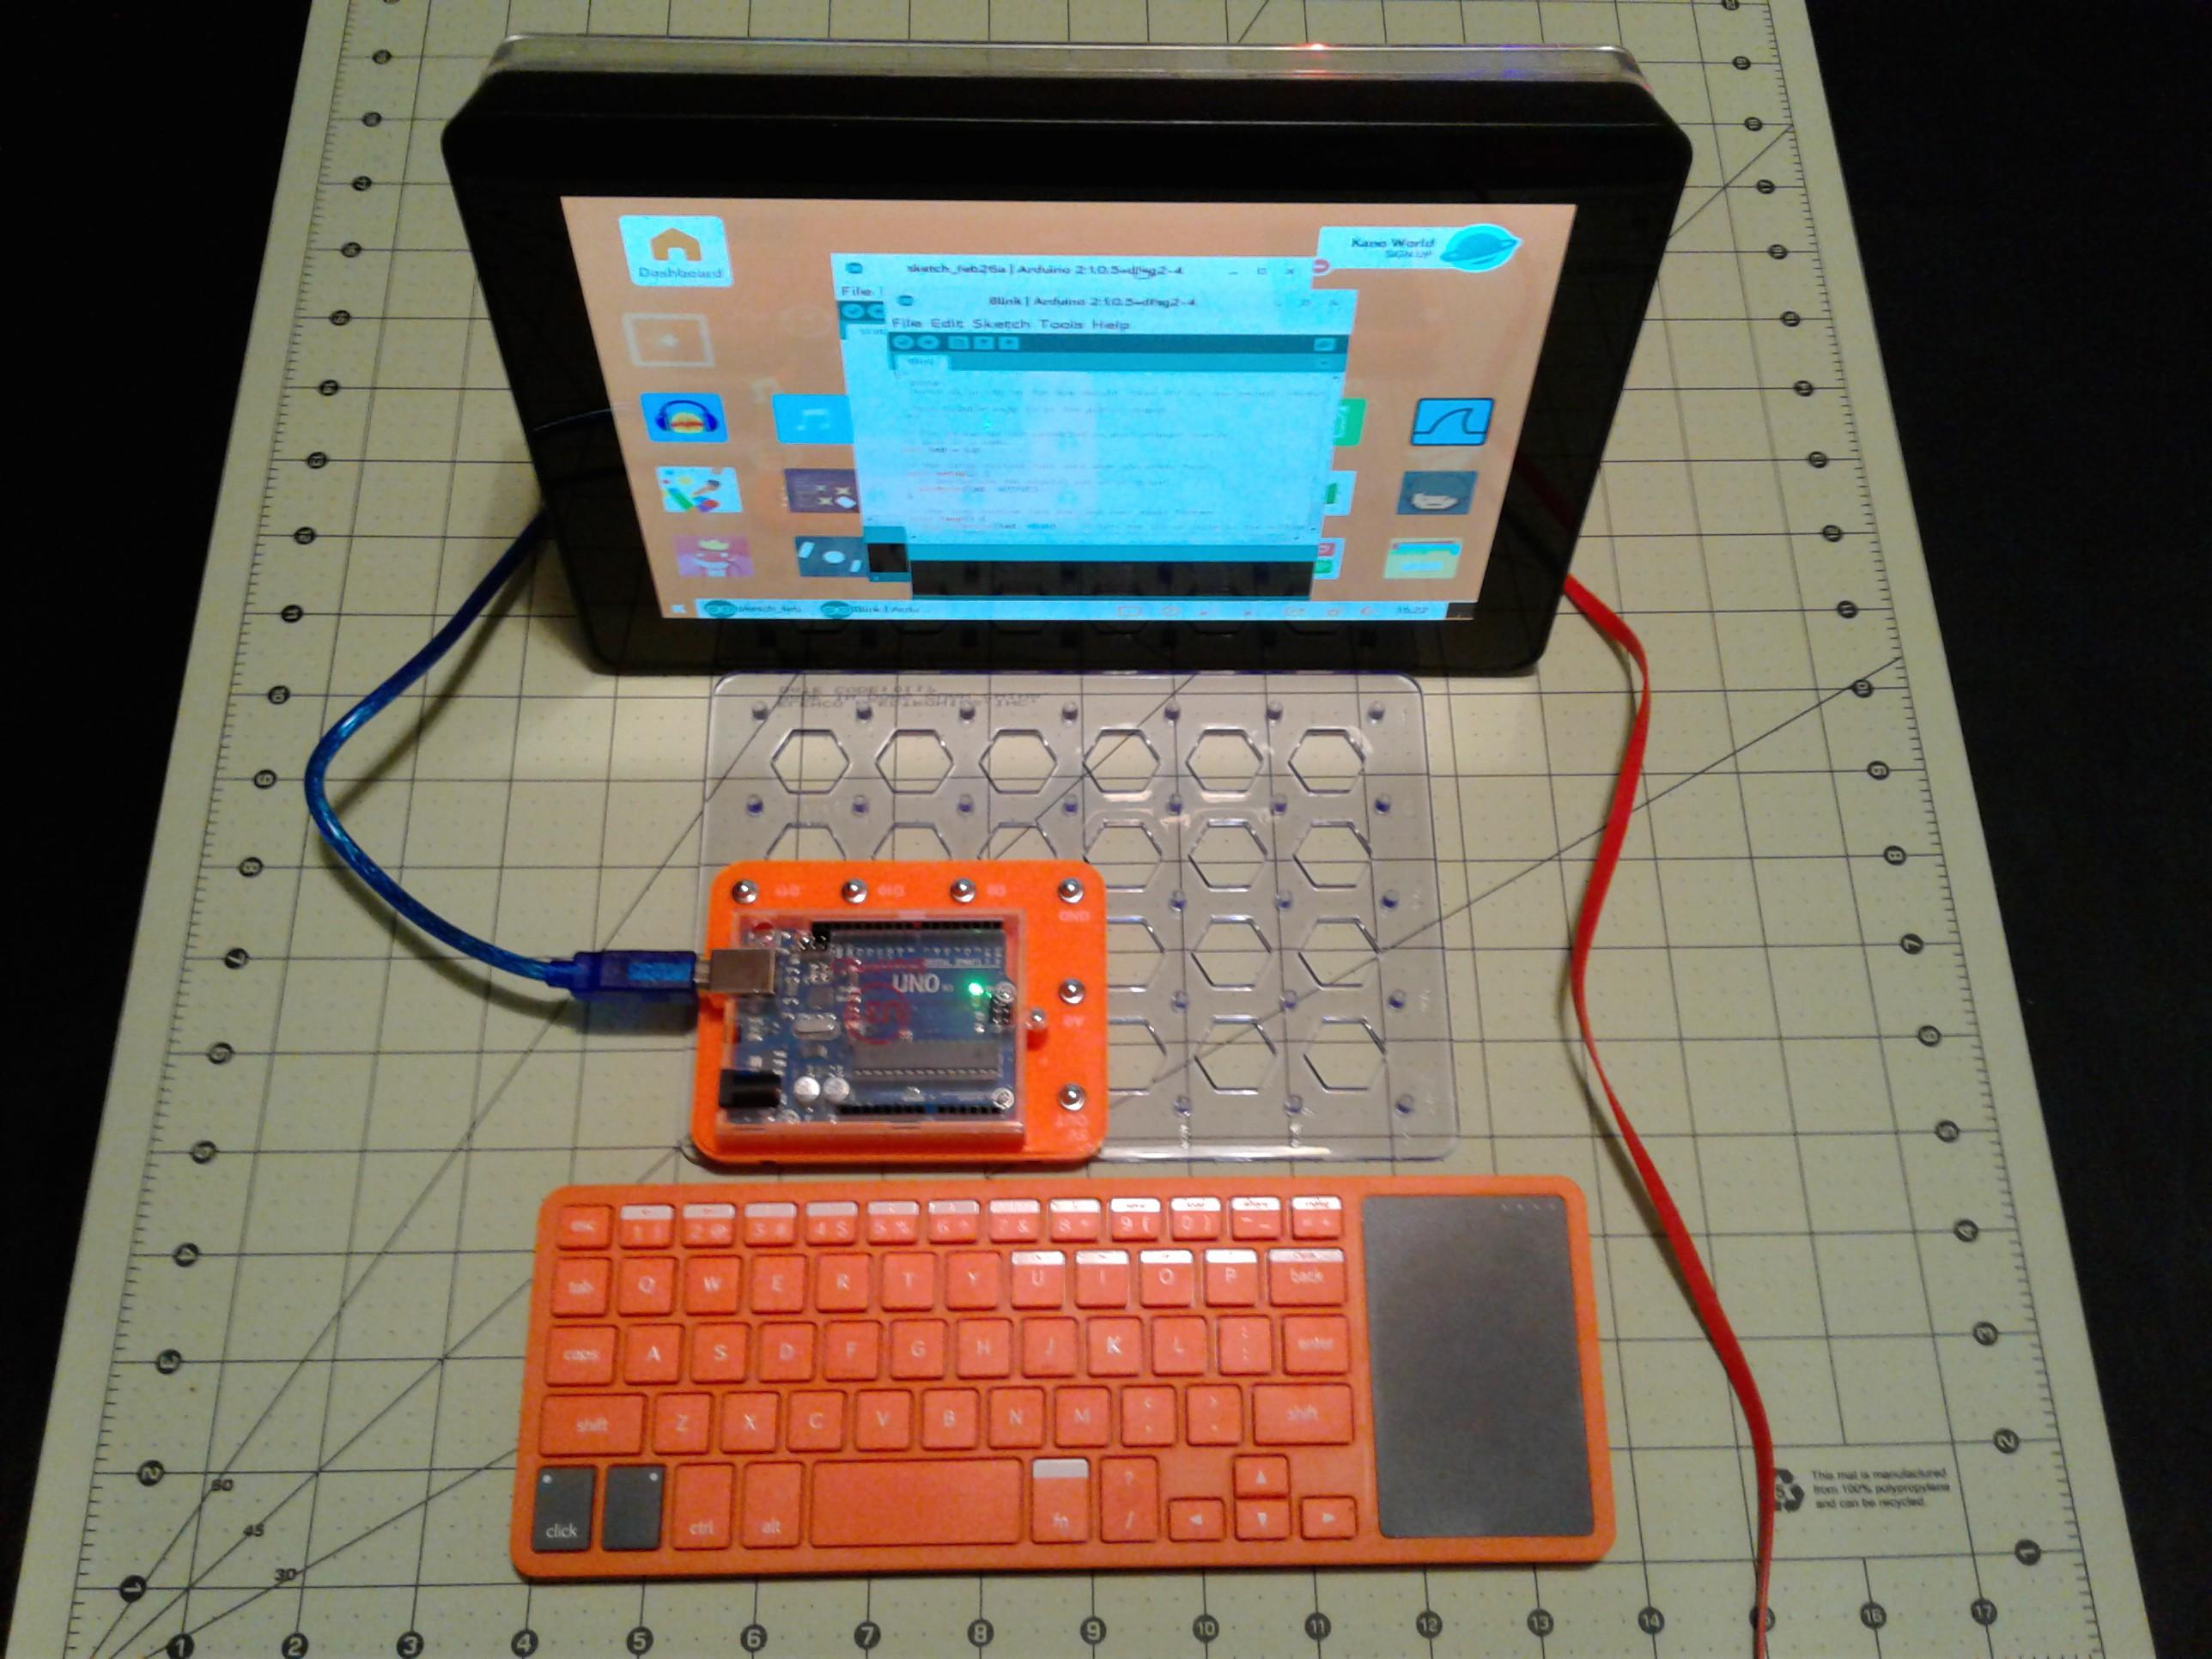 Raspberry Pi, Arduino, & Science Toys Teach STEAM | Details